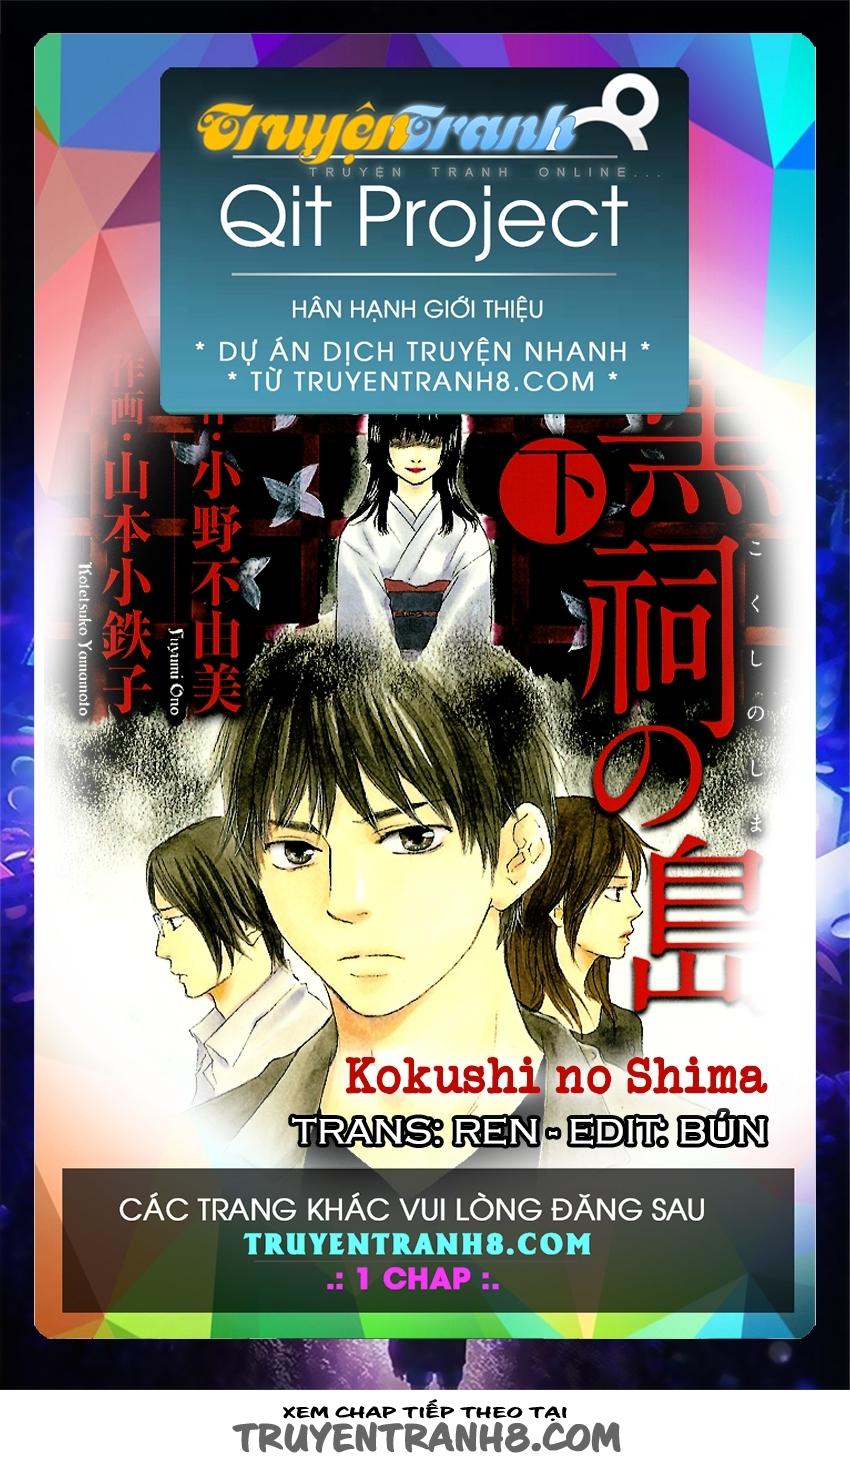 Kokushi no shima chap 7